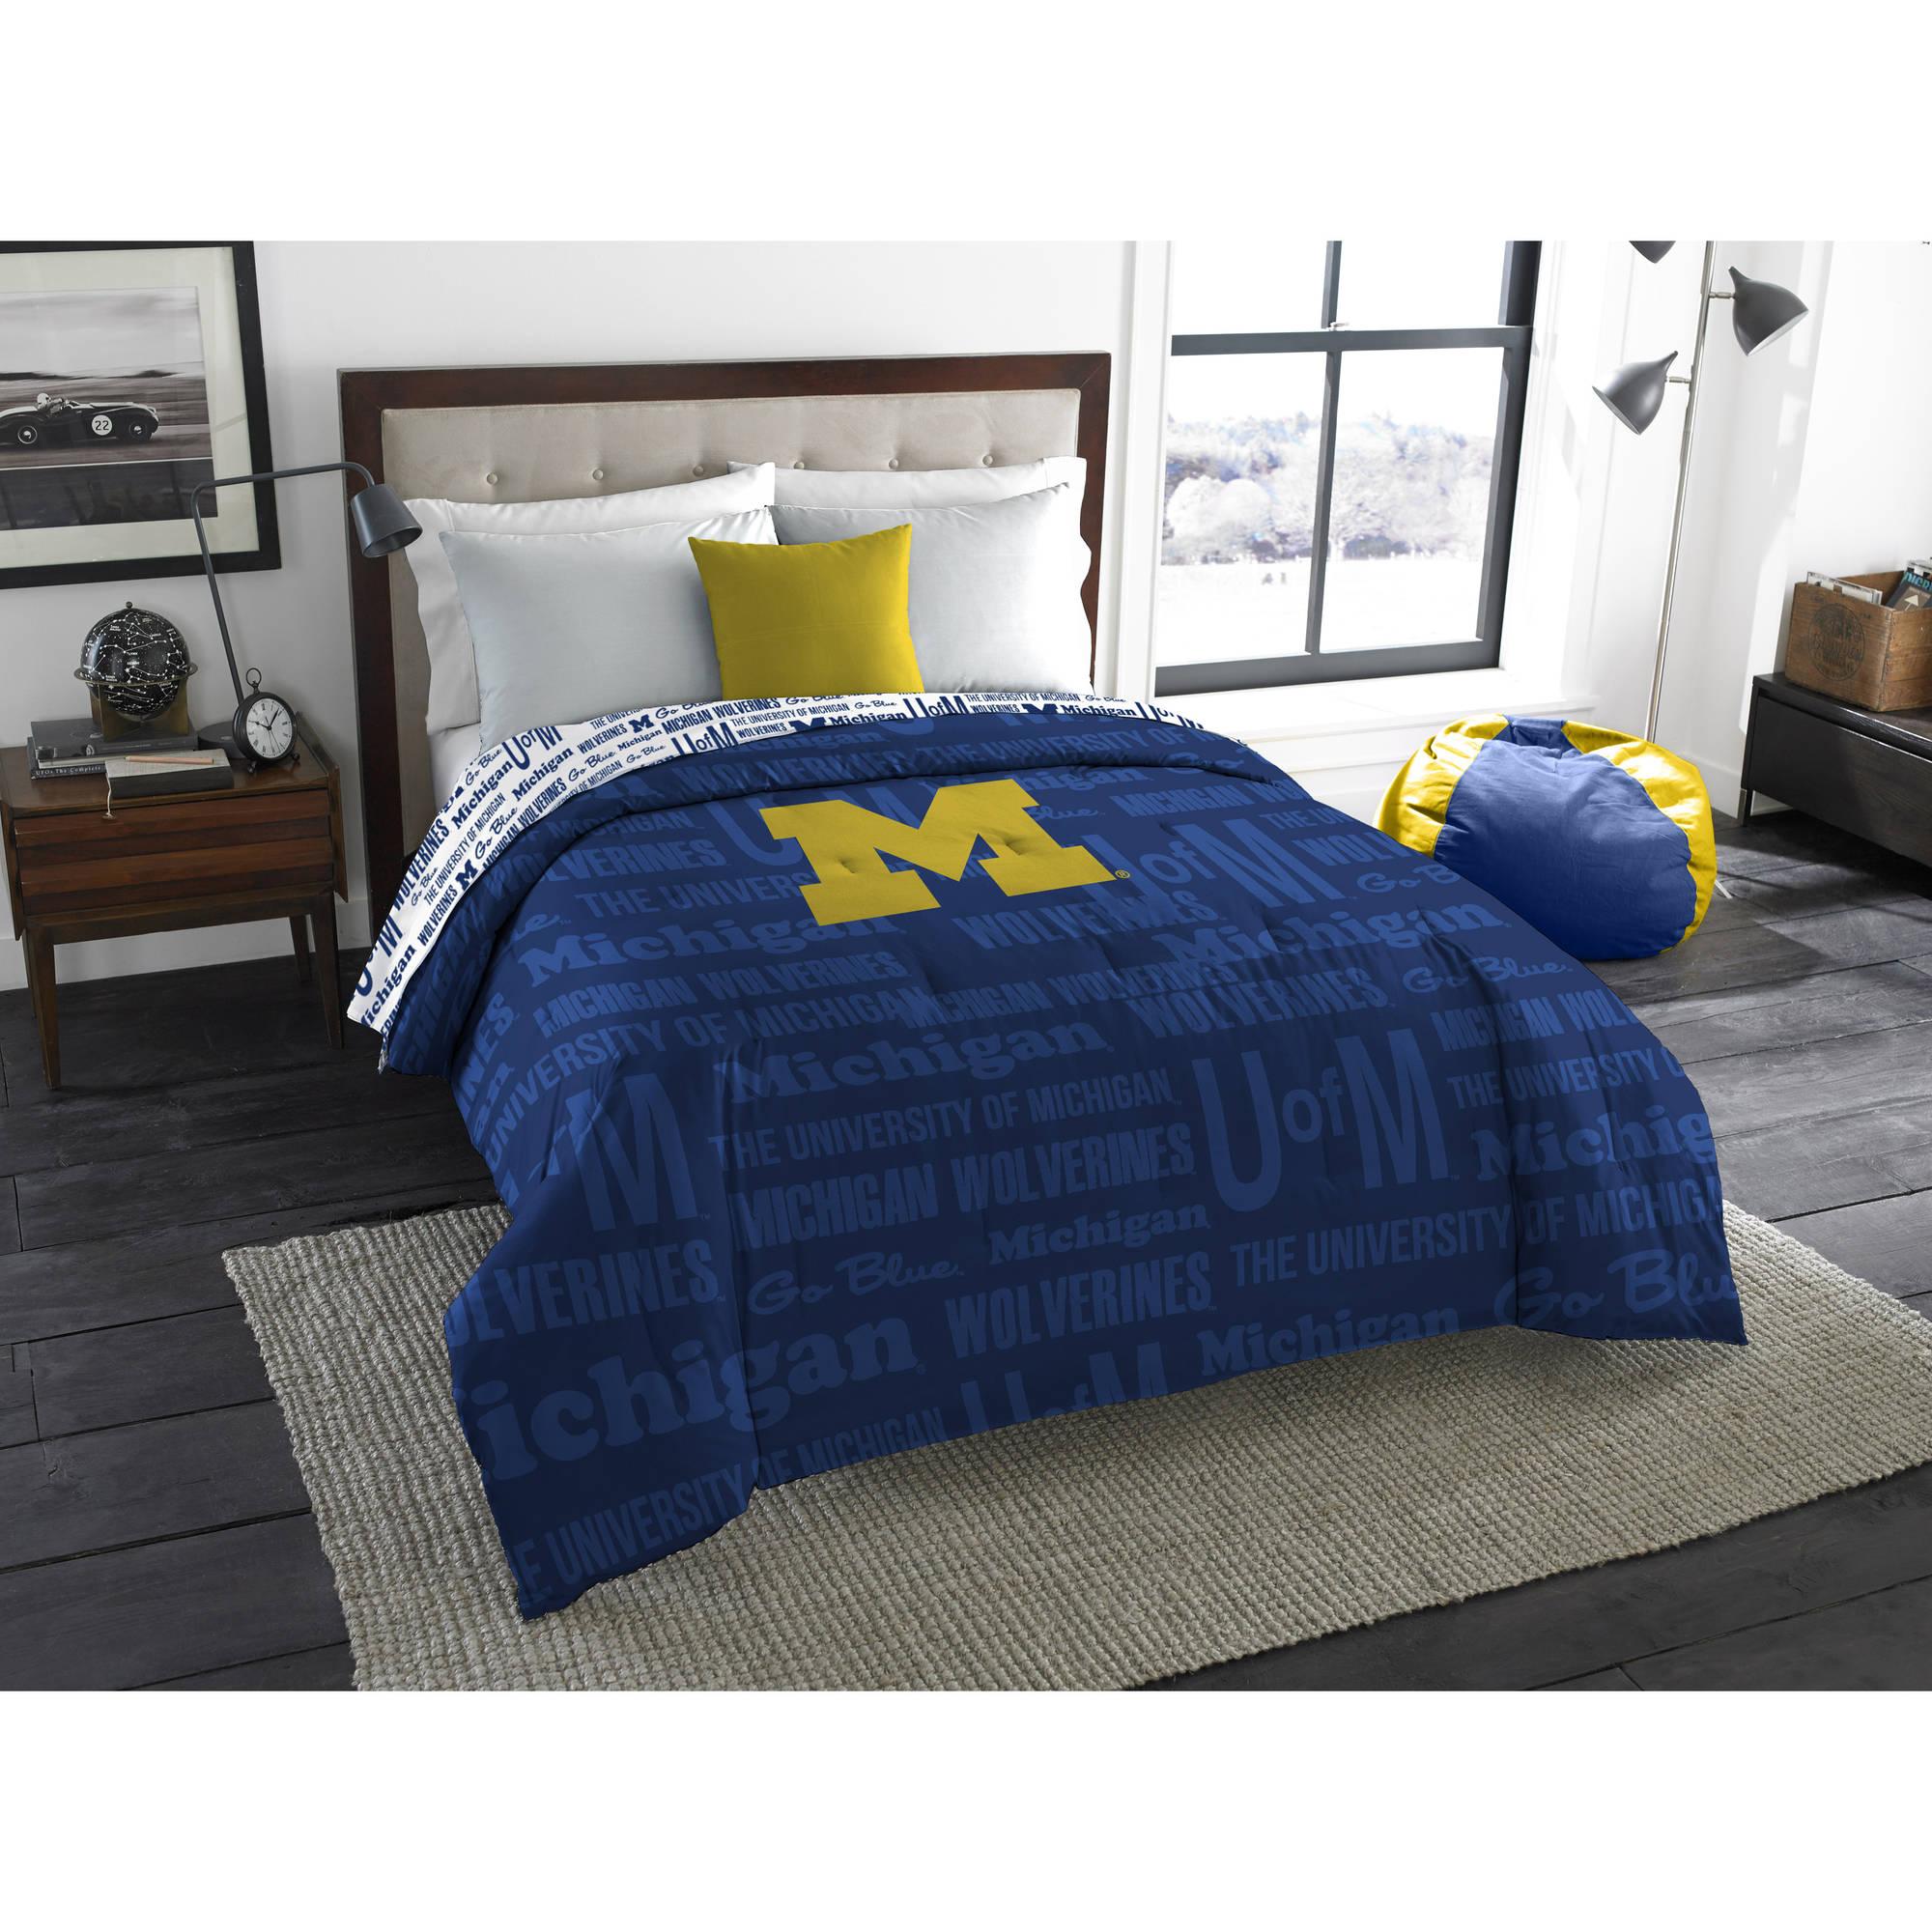 "NCAA Michigan Wolverines ""Anthem"" Twin/Full Bedding Comforter"